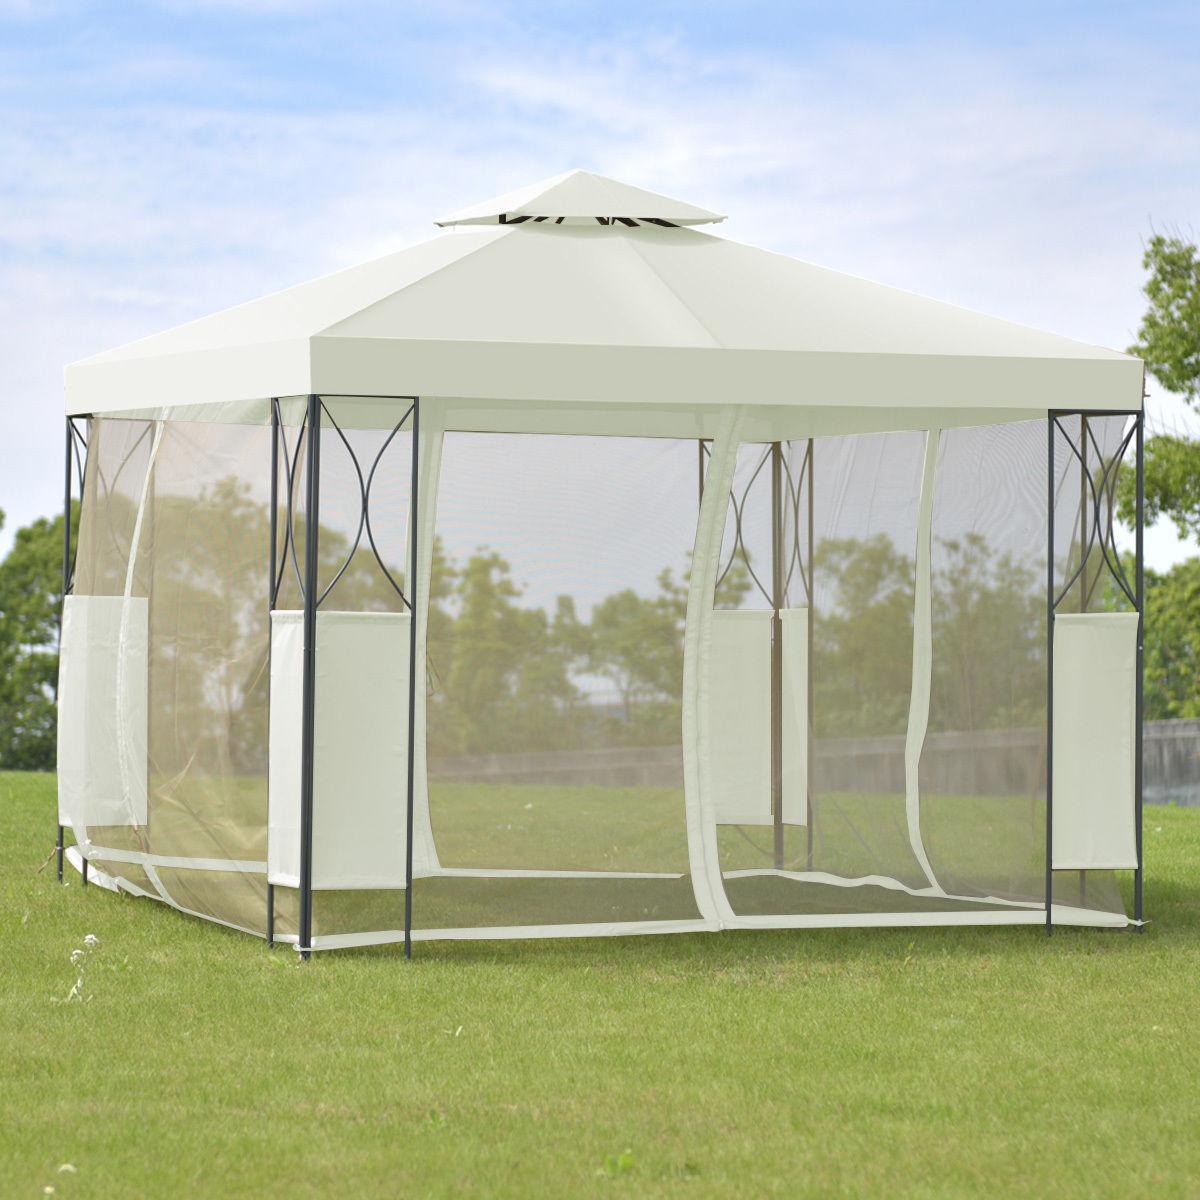 Goplus 2 Tier 10 'x10 'gazebo Canopy Tent Shelter Wedding Party Awning Steel Patio Garden